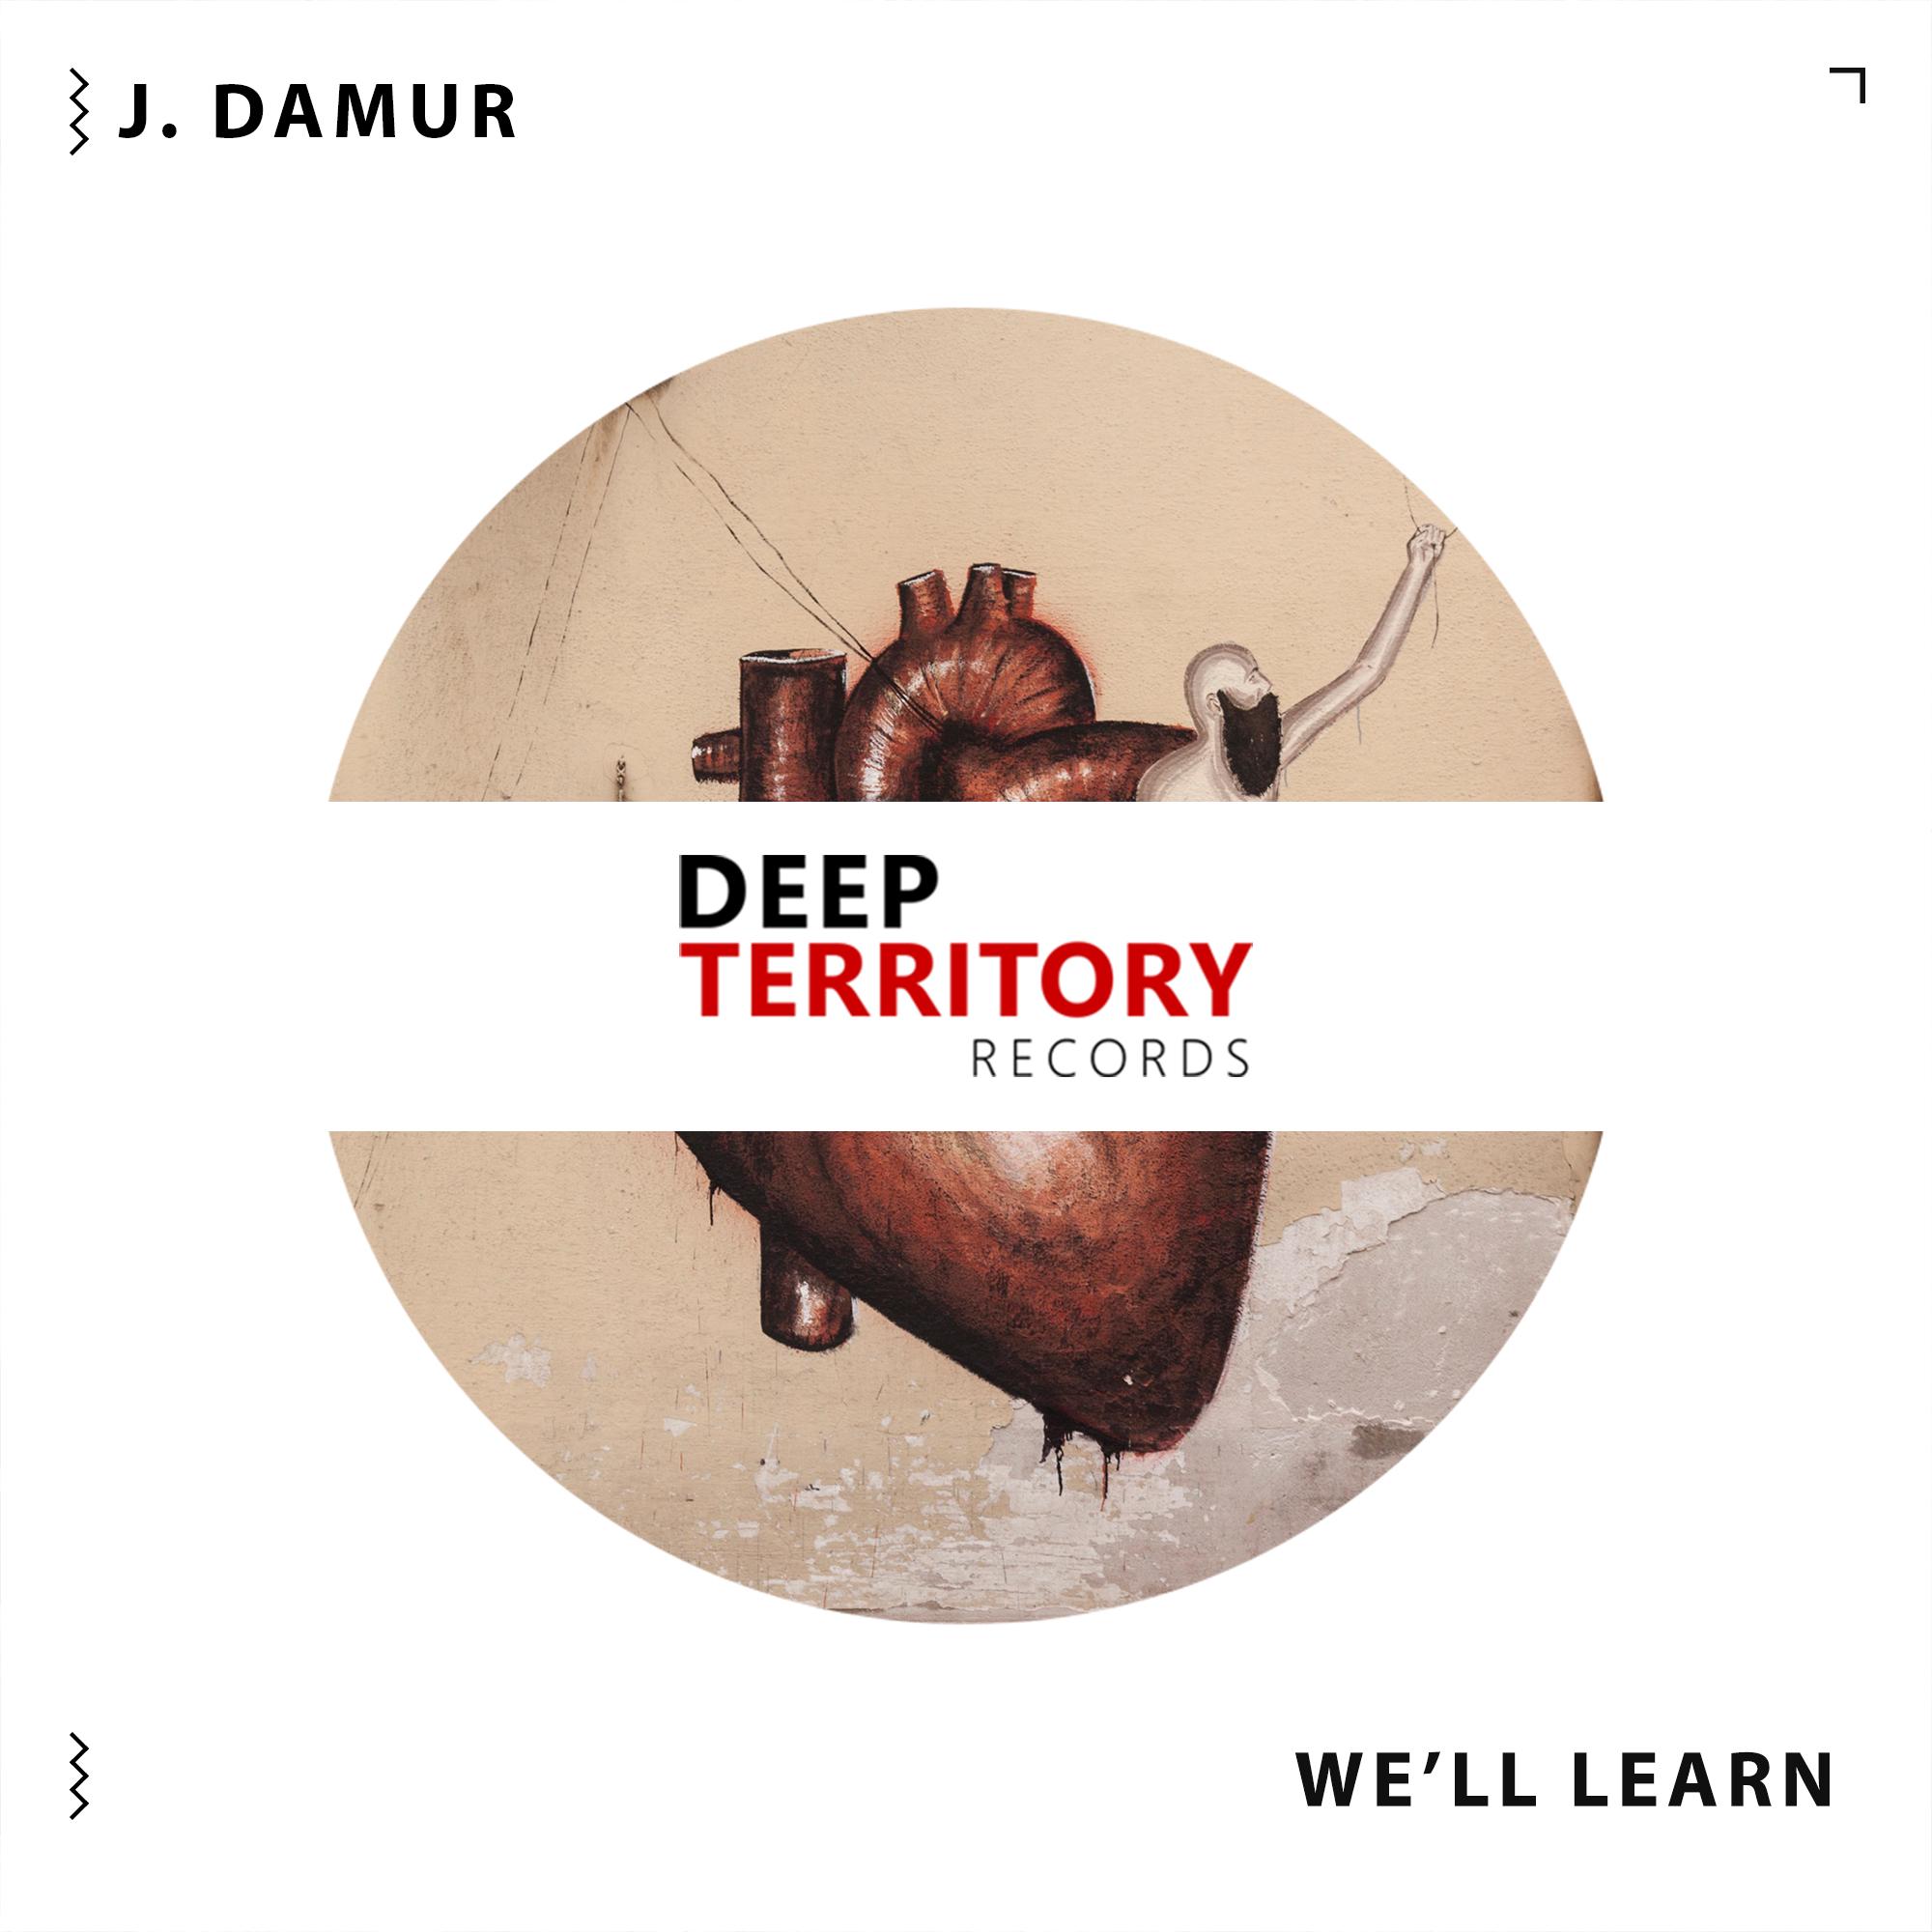 J. Damur Image